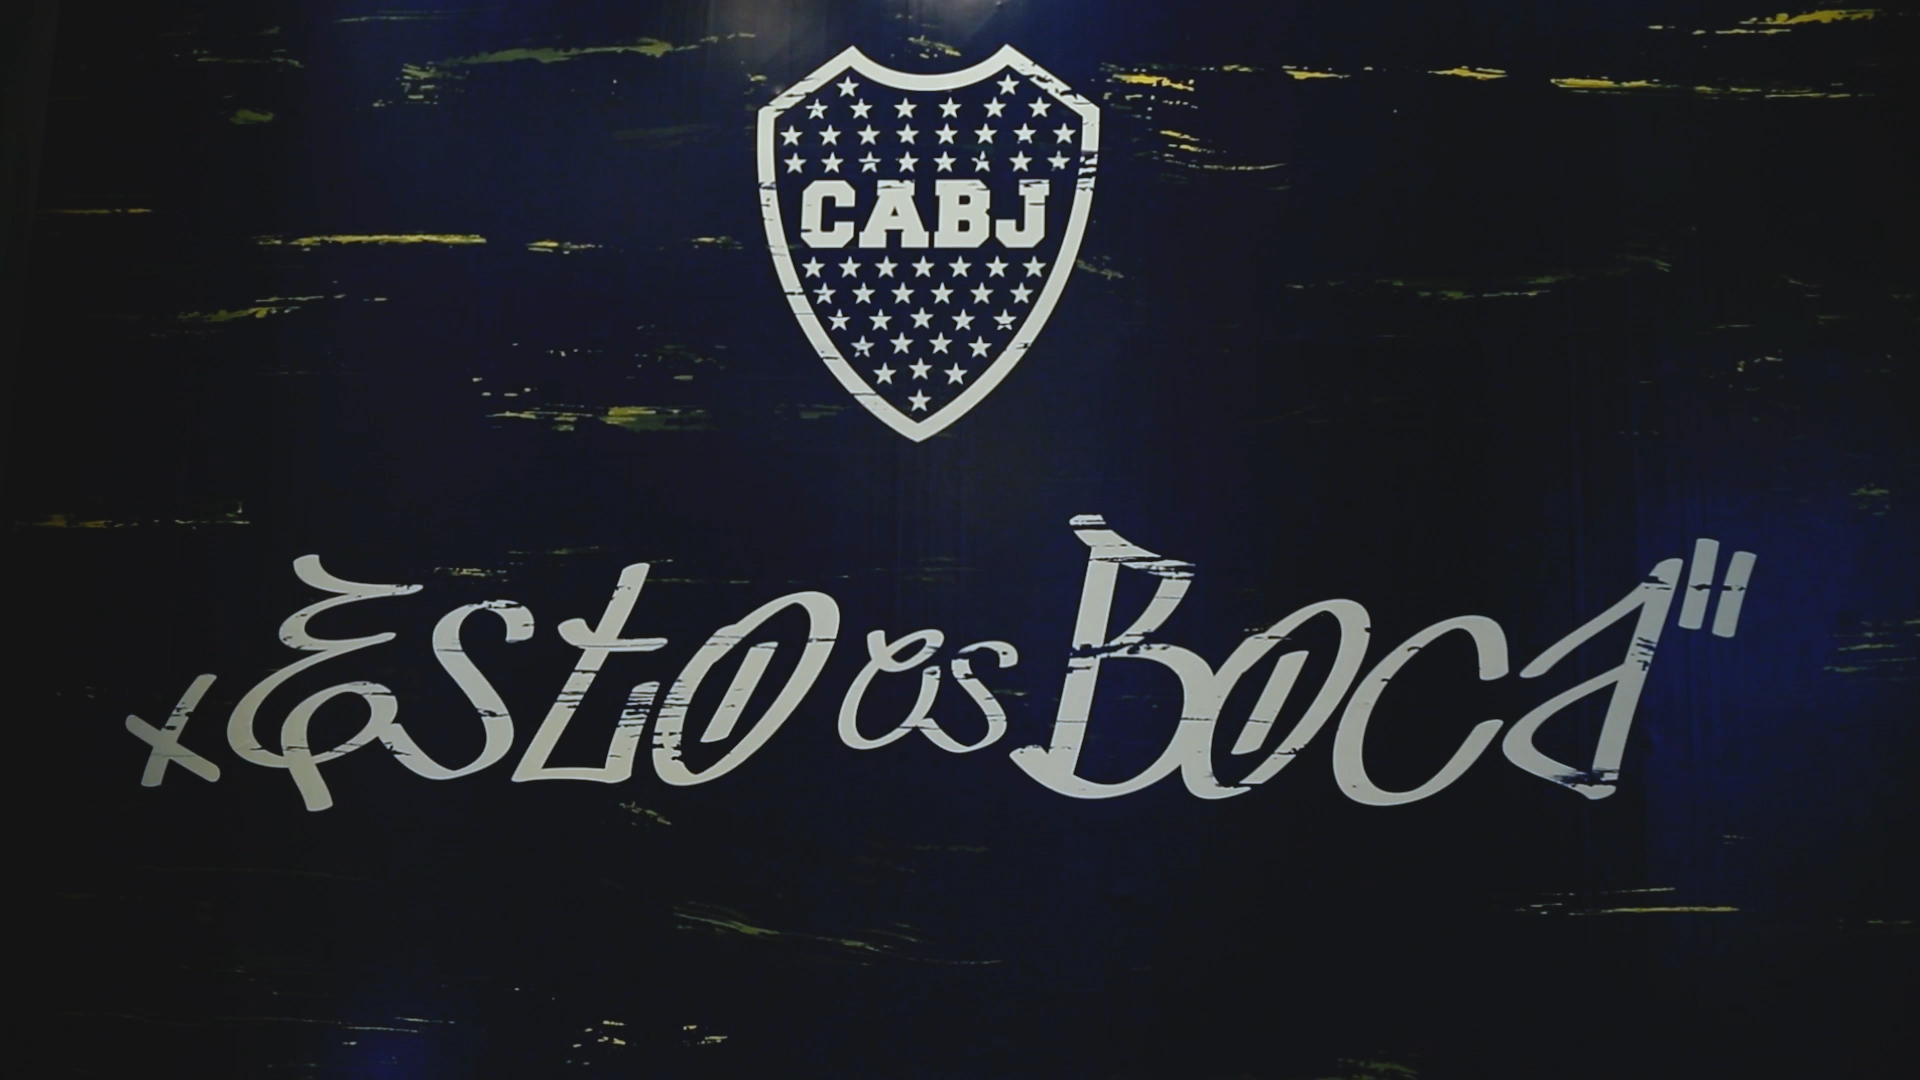 This is Boca Typography_7.jpg